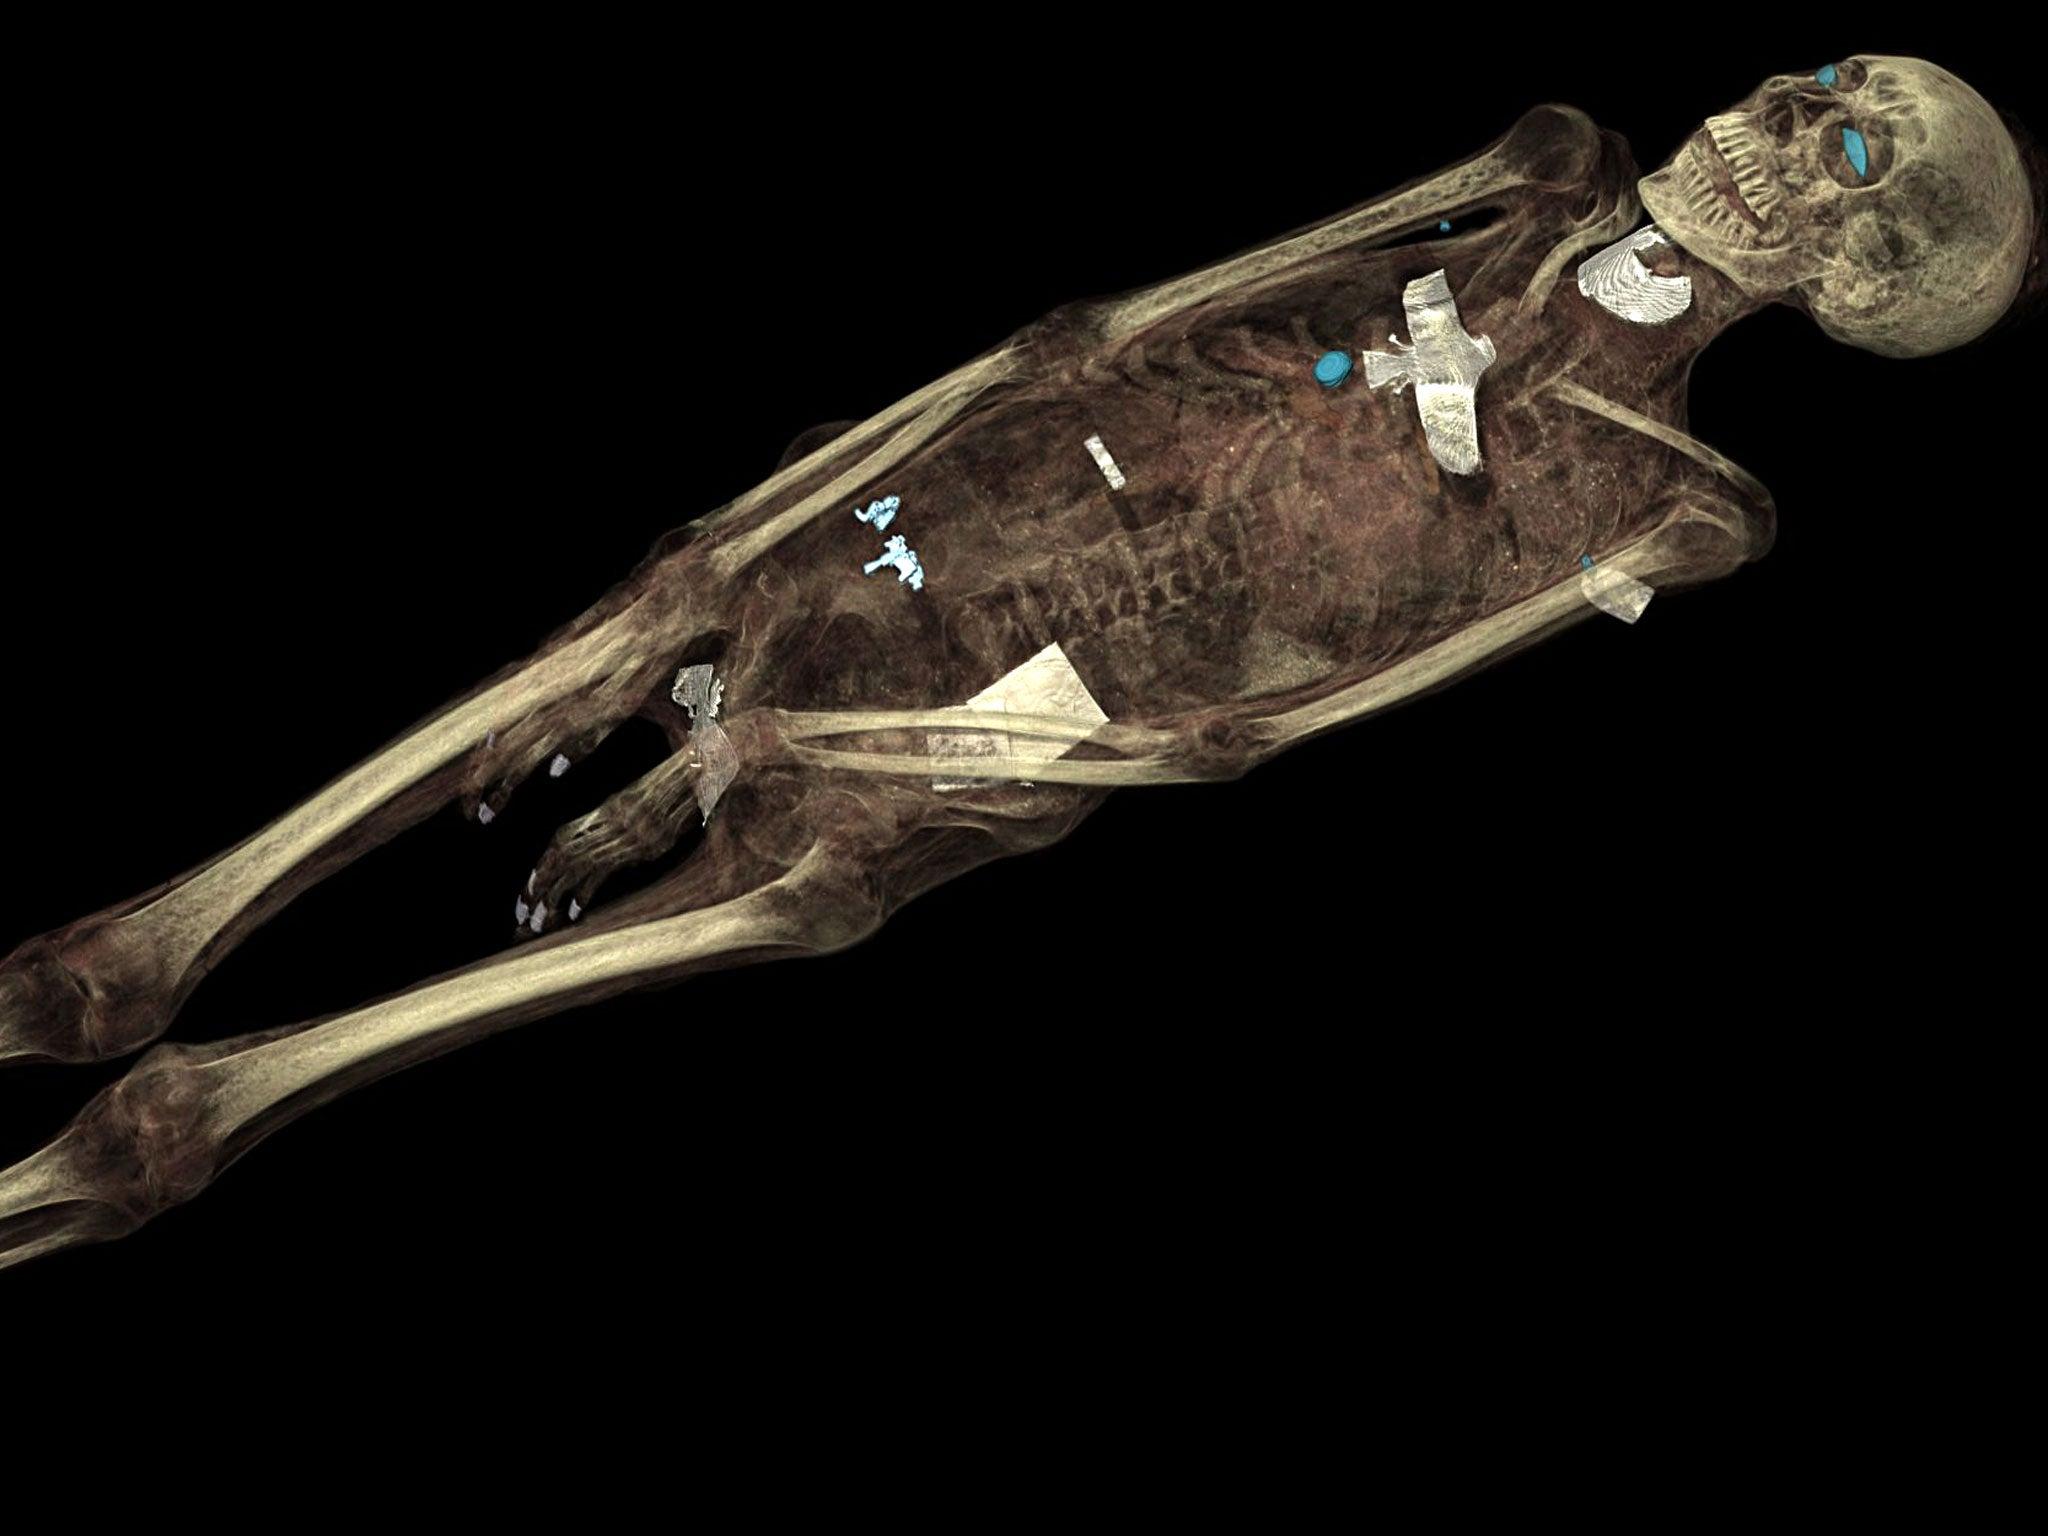 Egyptian mummies: Science or sacrilege?